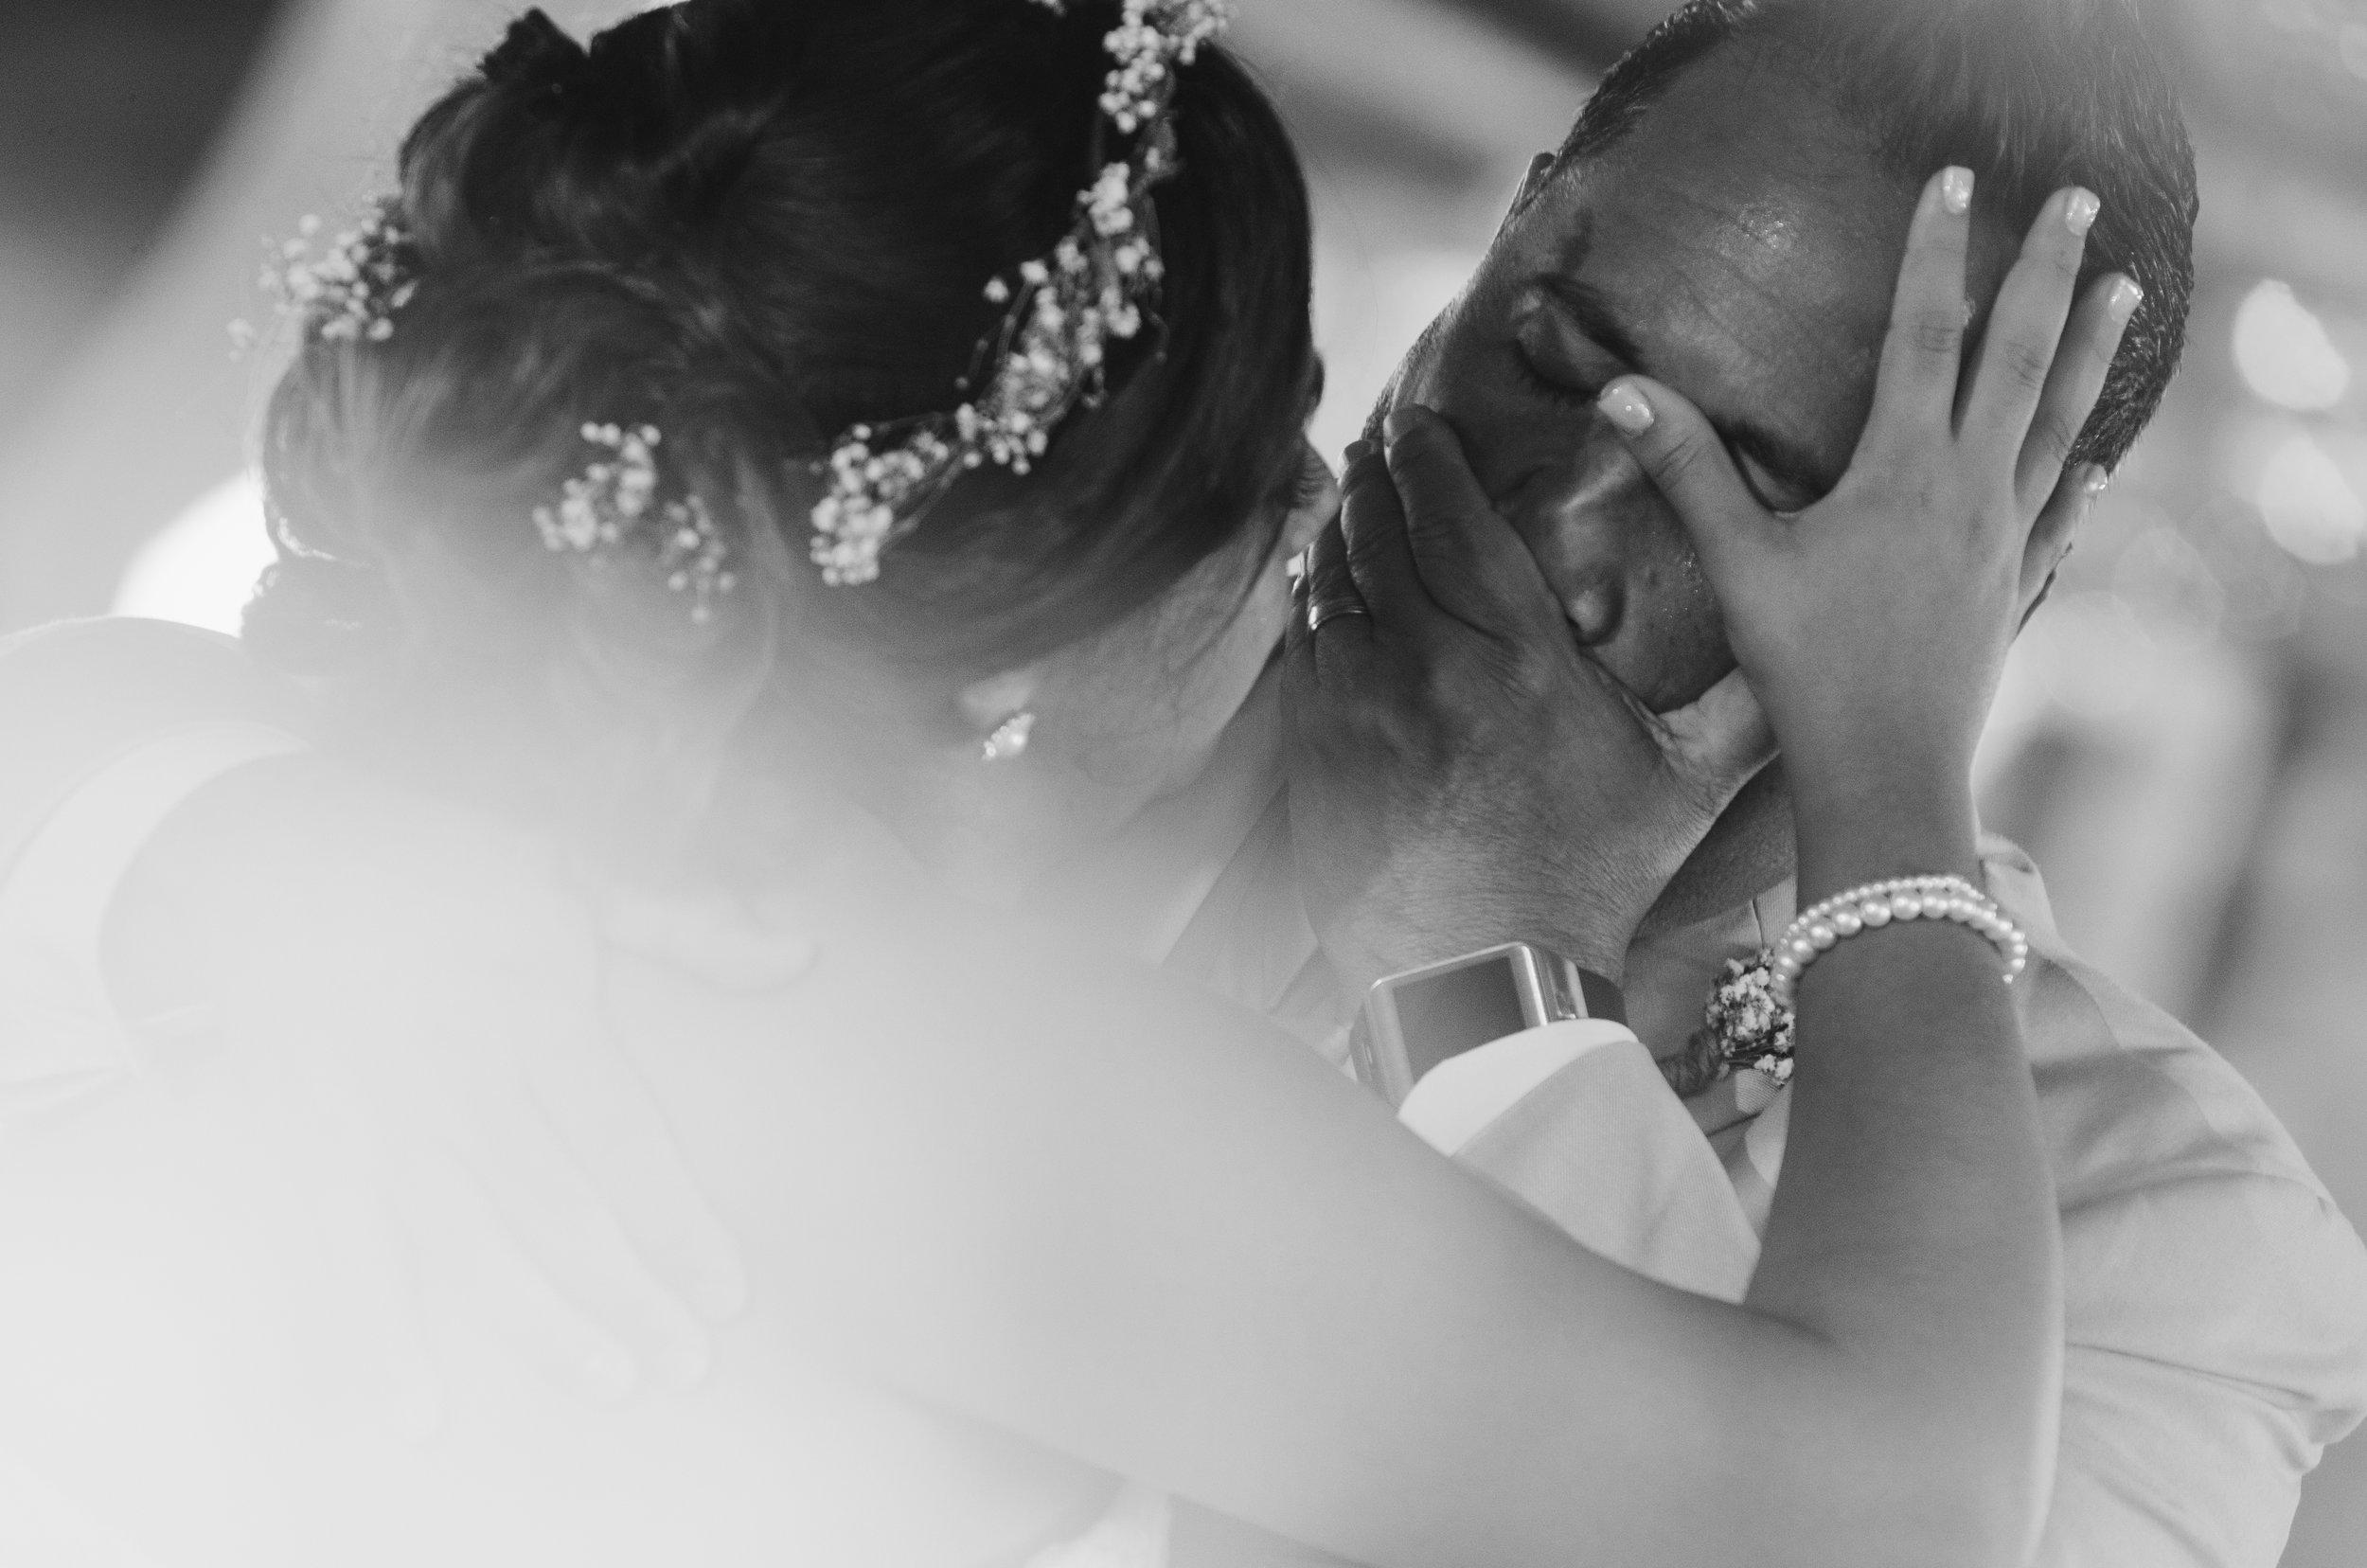 central-fl-christian-wedding-day-22.jpg